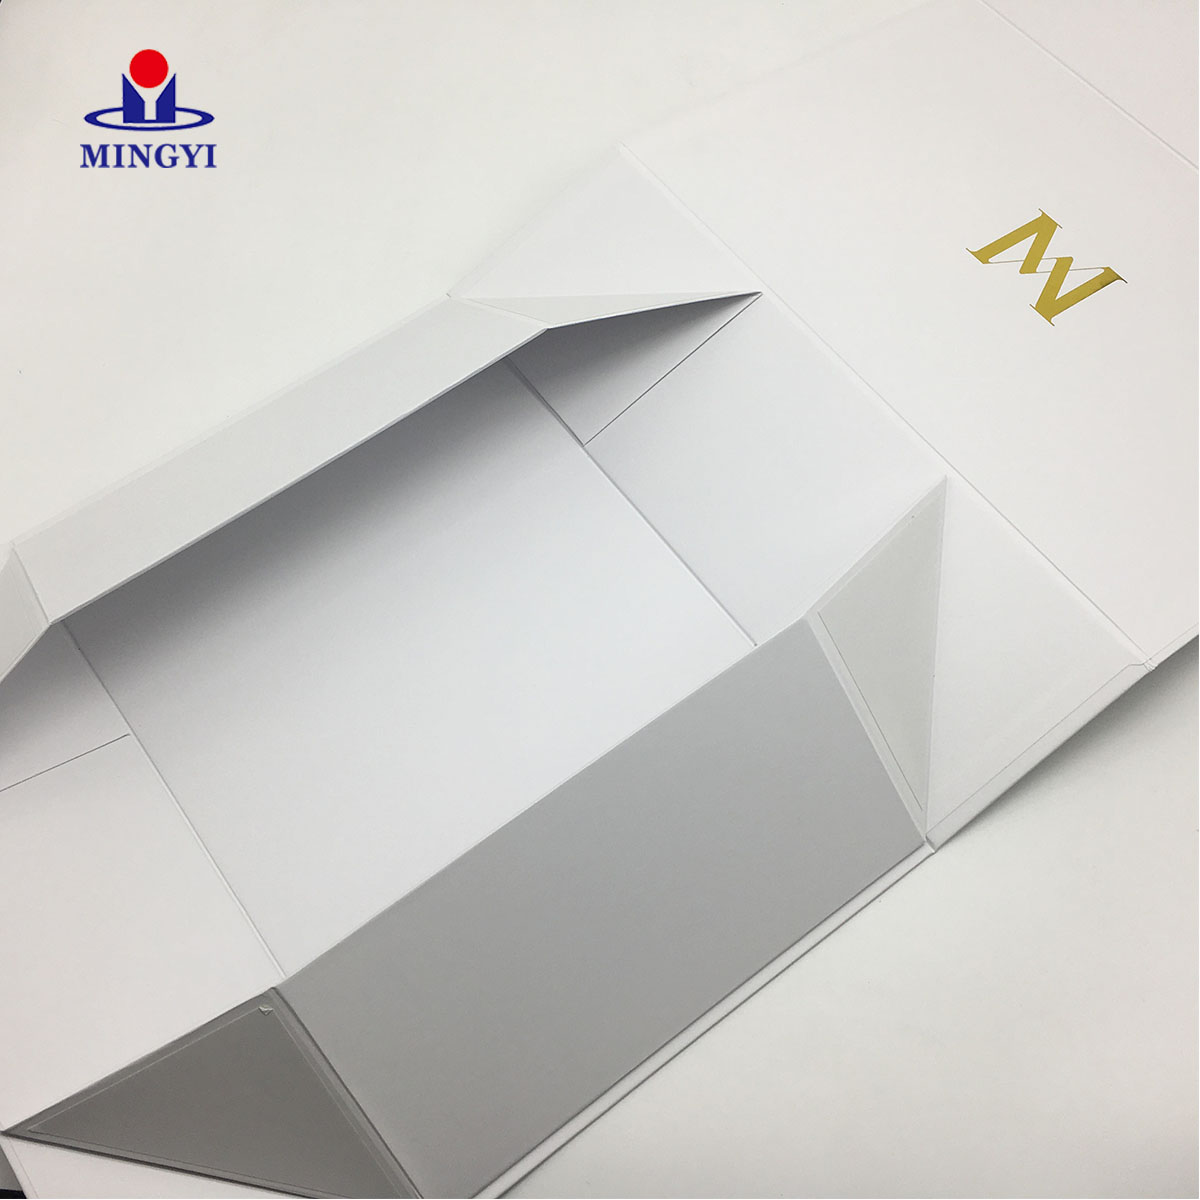 Mingyi Printing Array image57